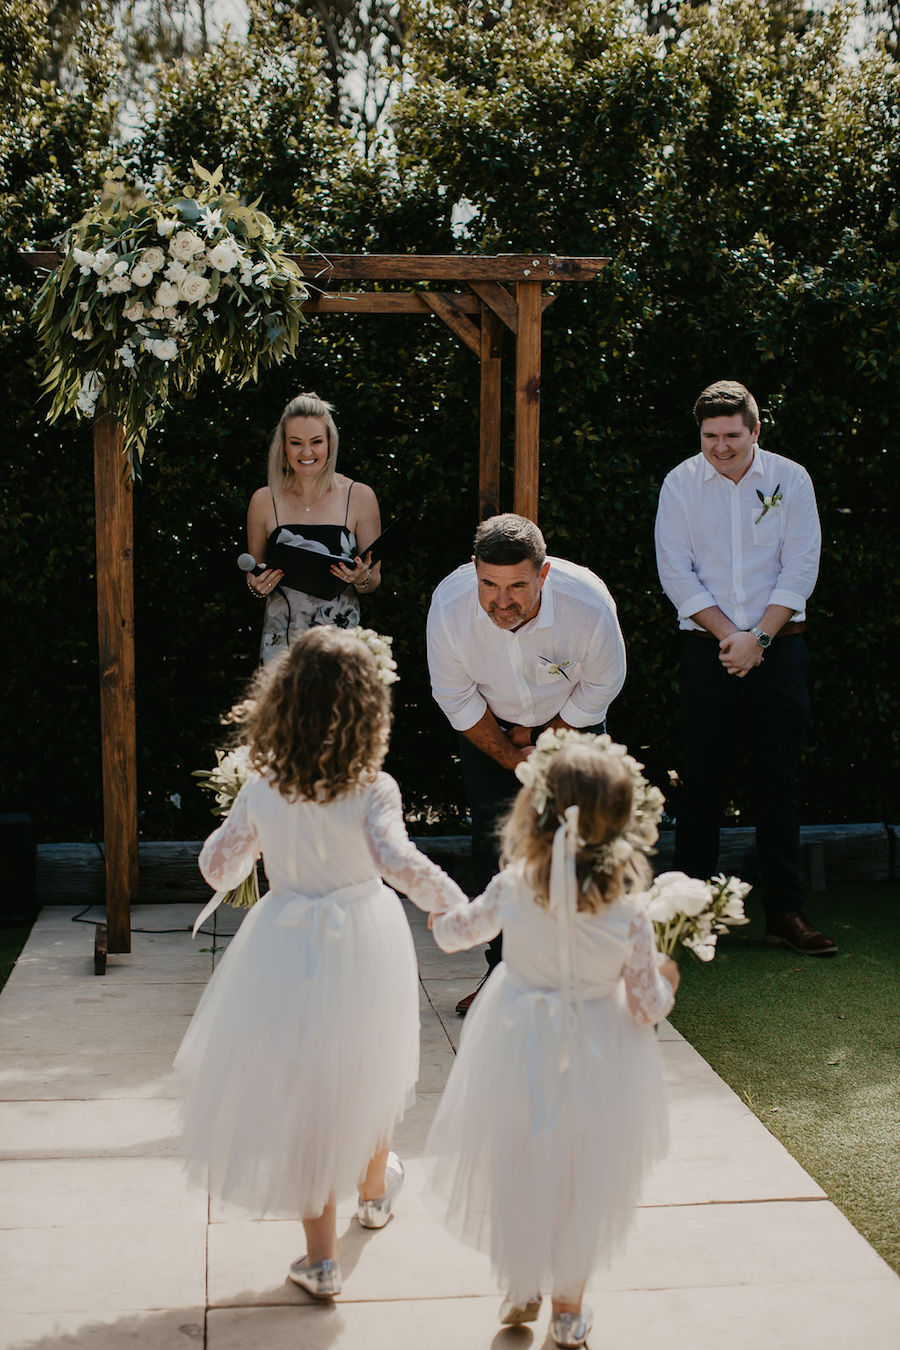 tweed-coast-weddings-wedding-venue-osteria-casuarina-ceremony-reception-5D3A6892.jpg